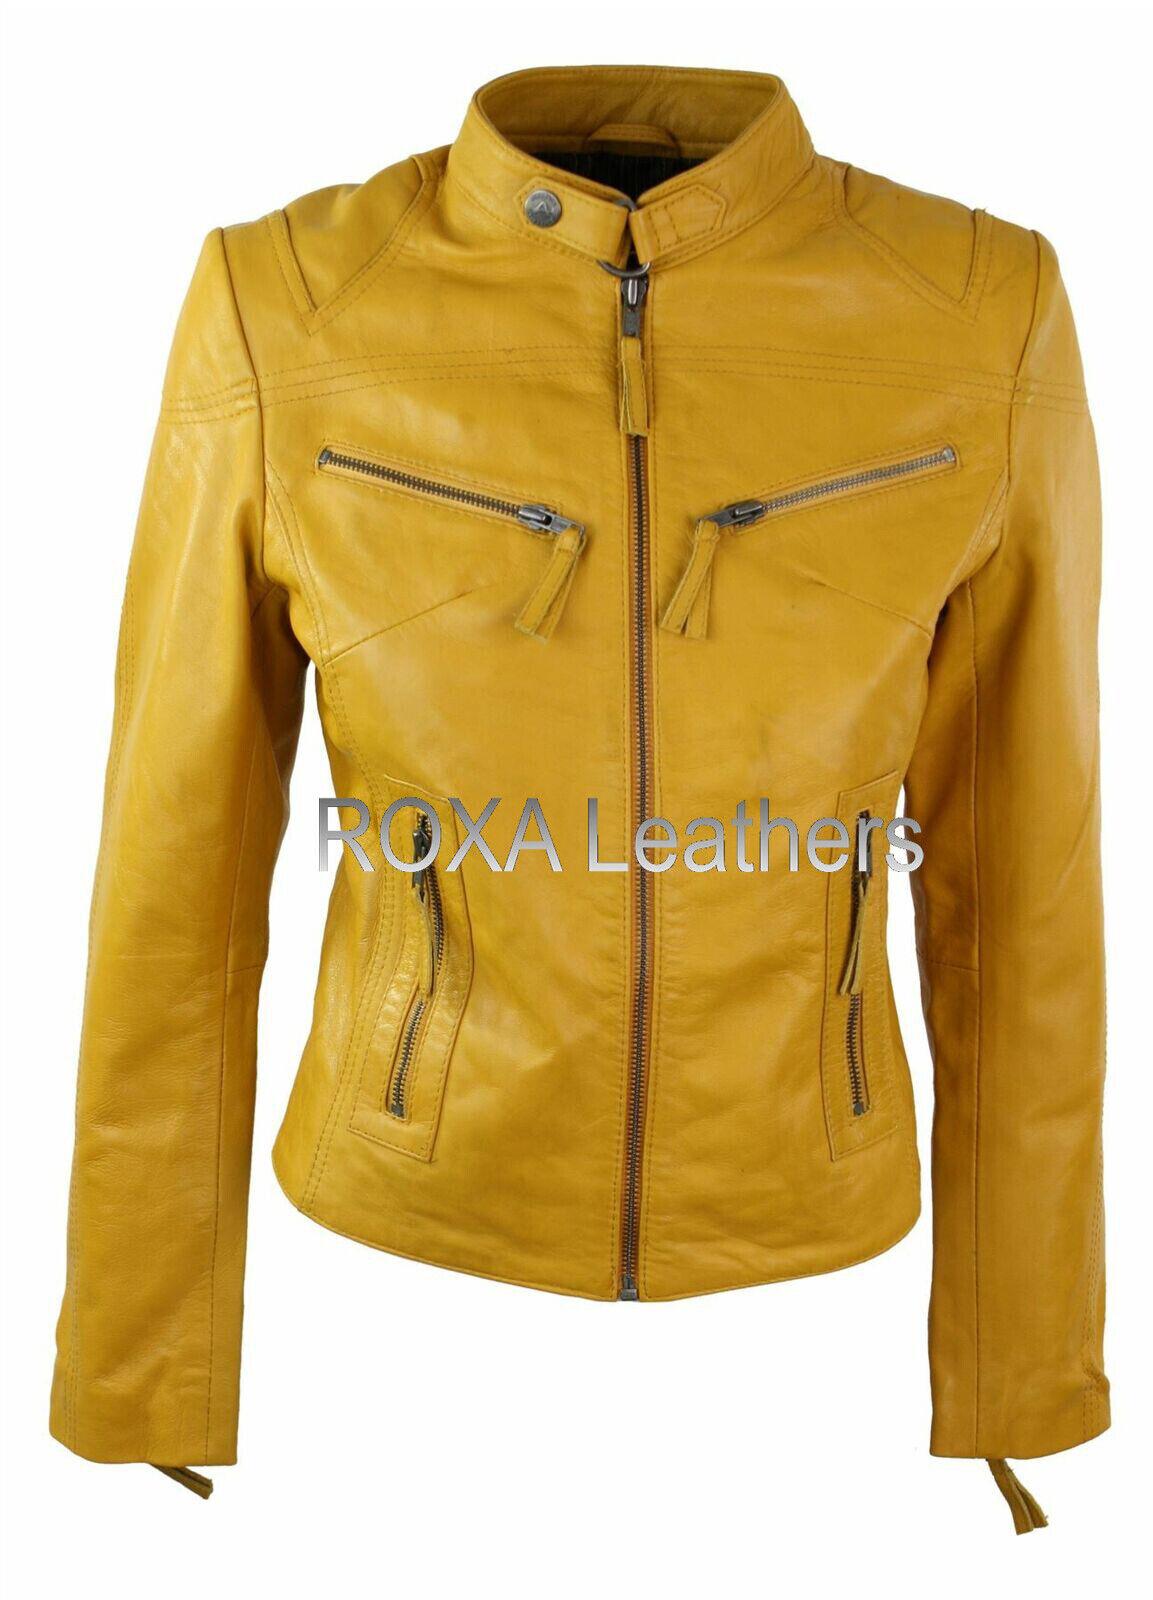 ROXA Women Party Wear Authentic Lambskin Pure Leather Jacket Yellow Fashion Coat